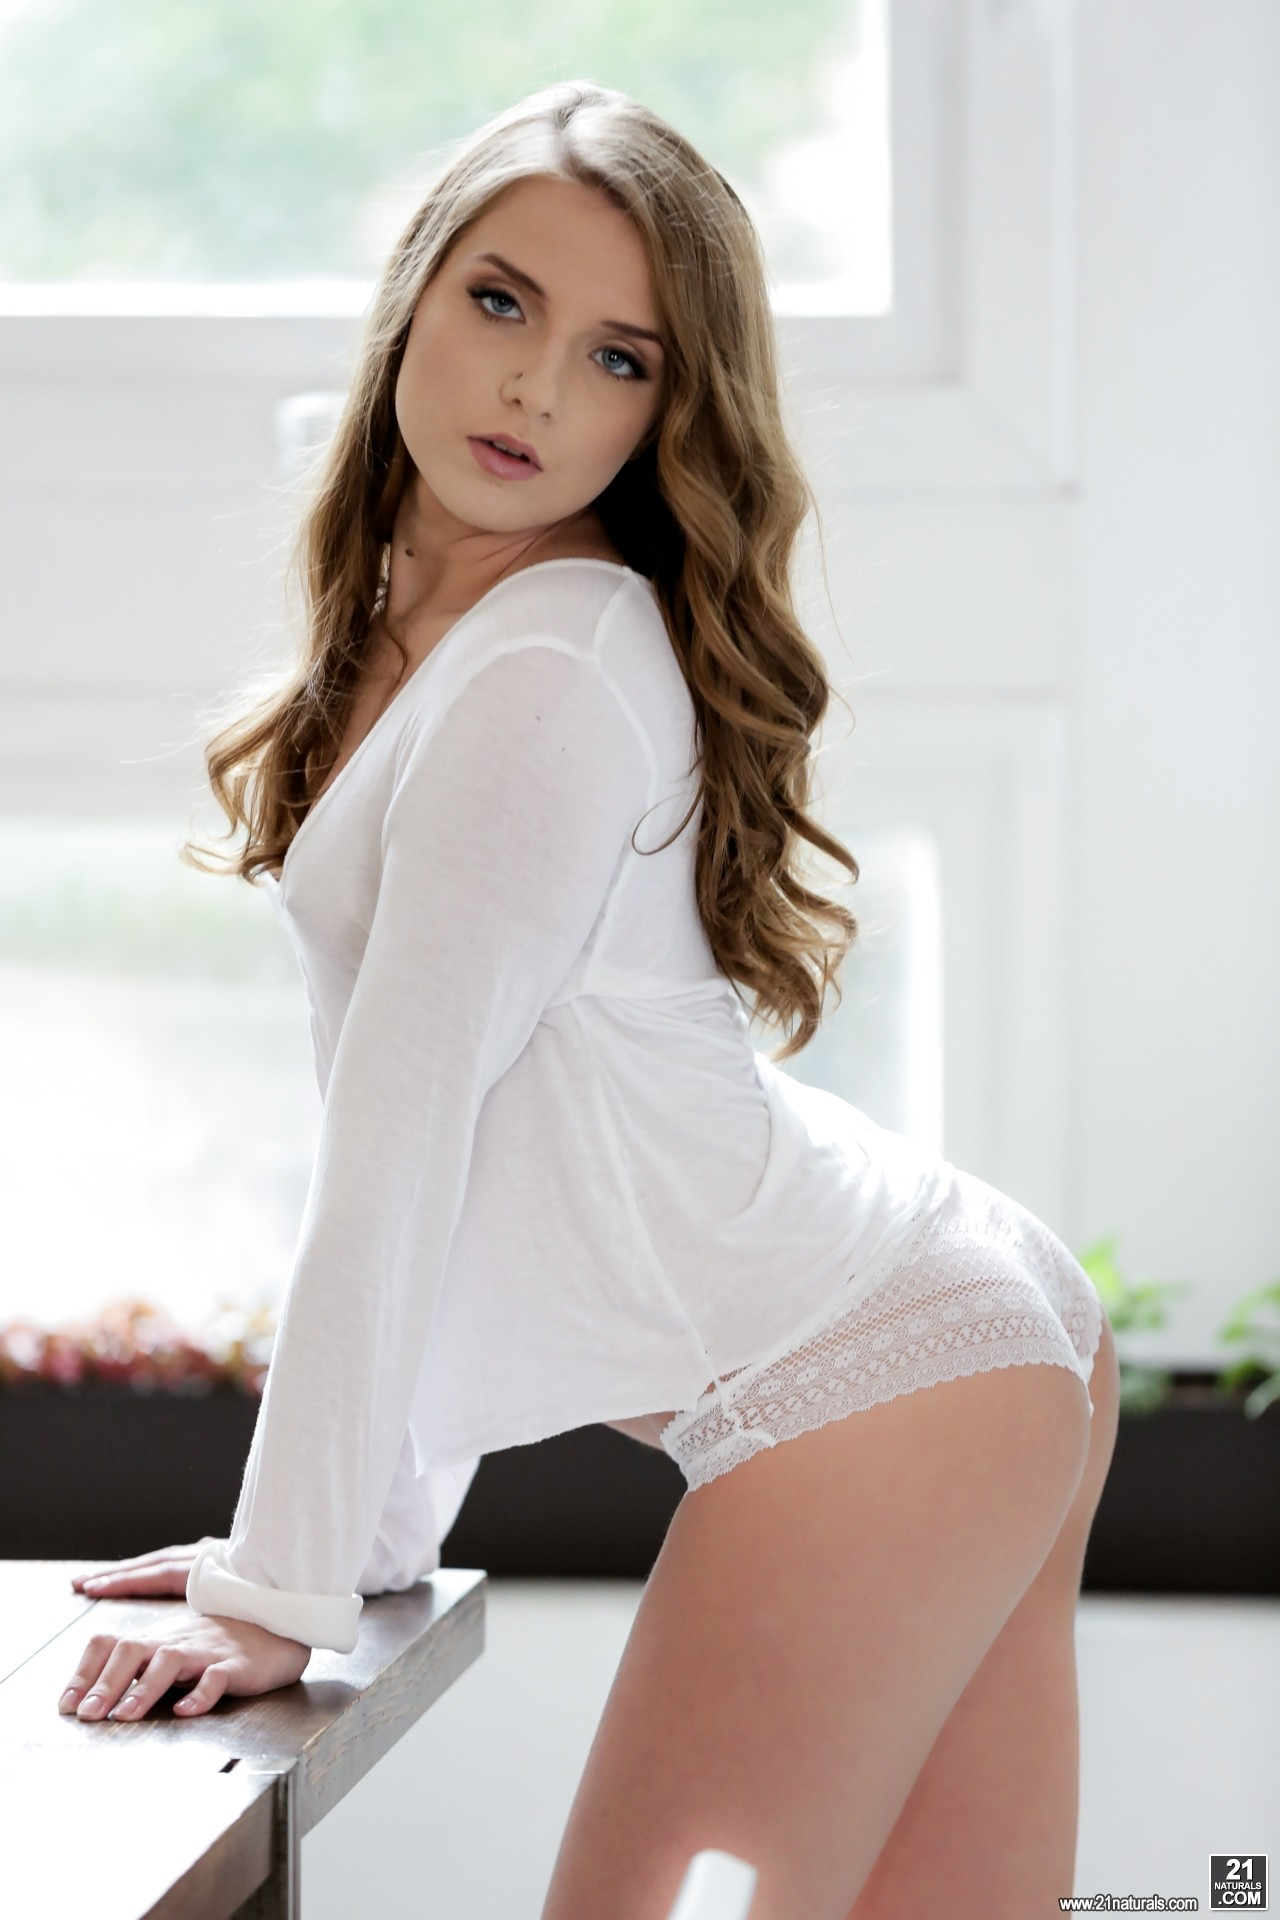 Hots Nude Porno Positions Photos